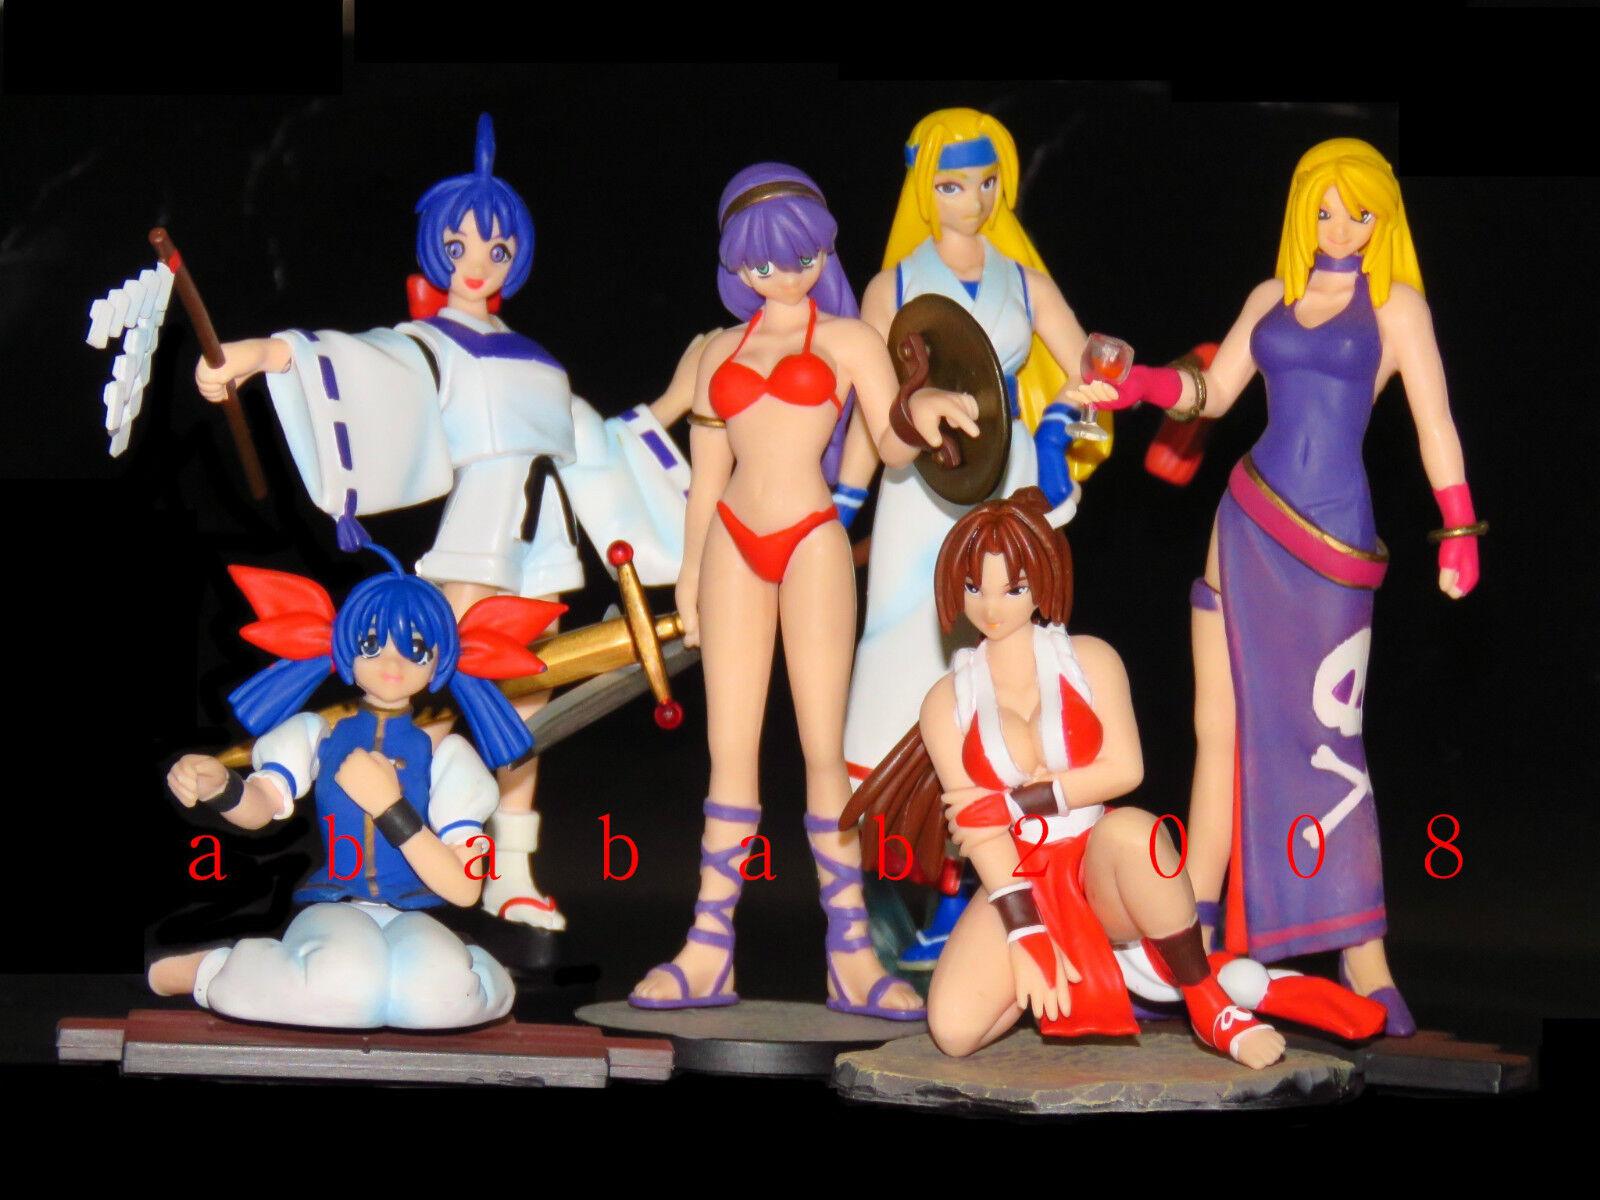 Yujin SR SR SR SNK KOF Fatal Fury Gals 2 gashapon figure set (full set of 6 figures) c7b843